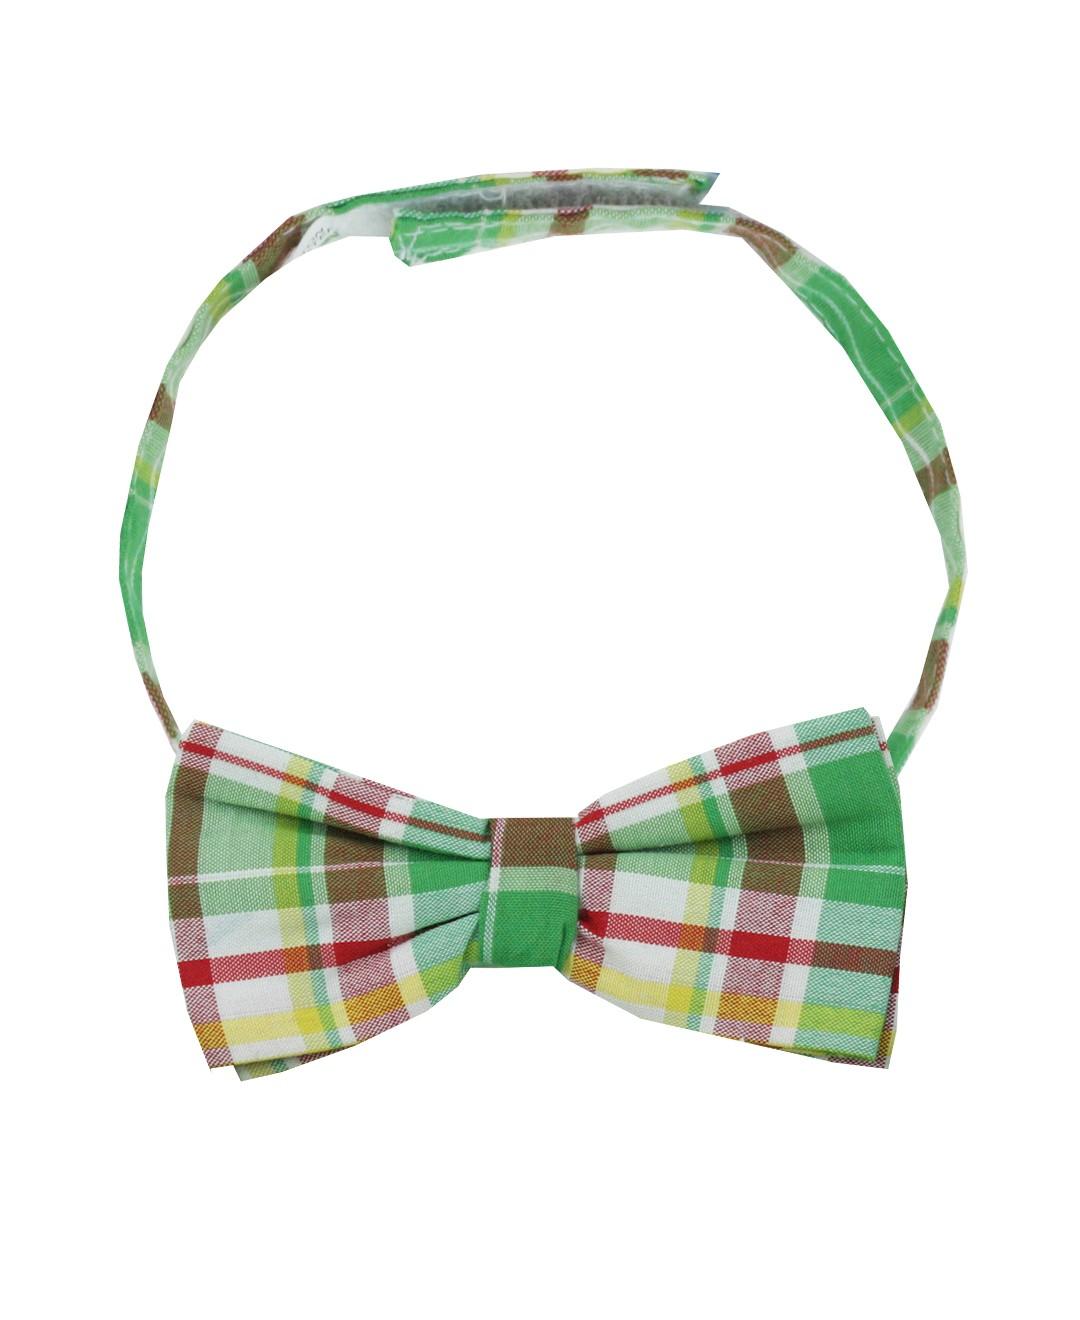 ruggedbutts-hayden-bow-tie-2.jpg